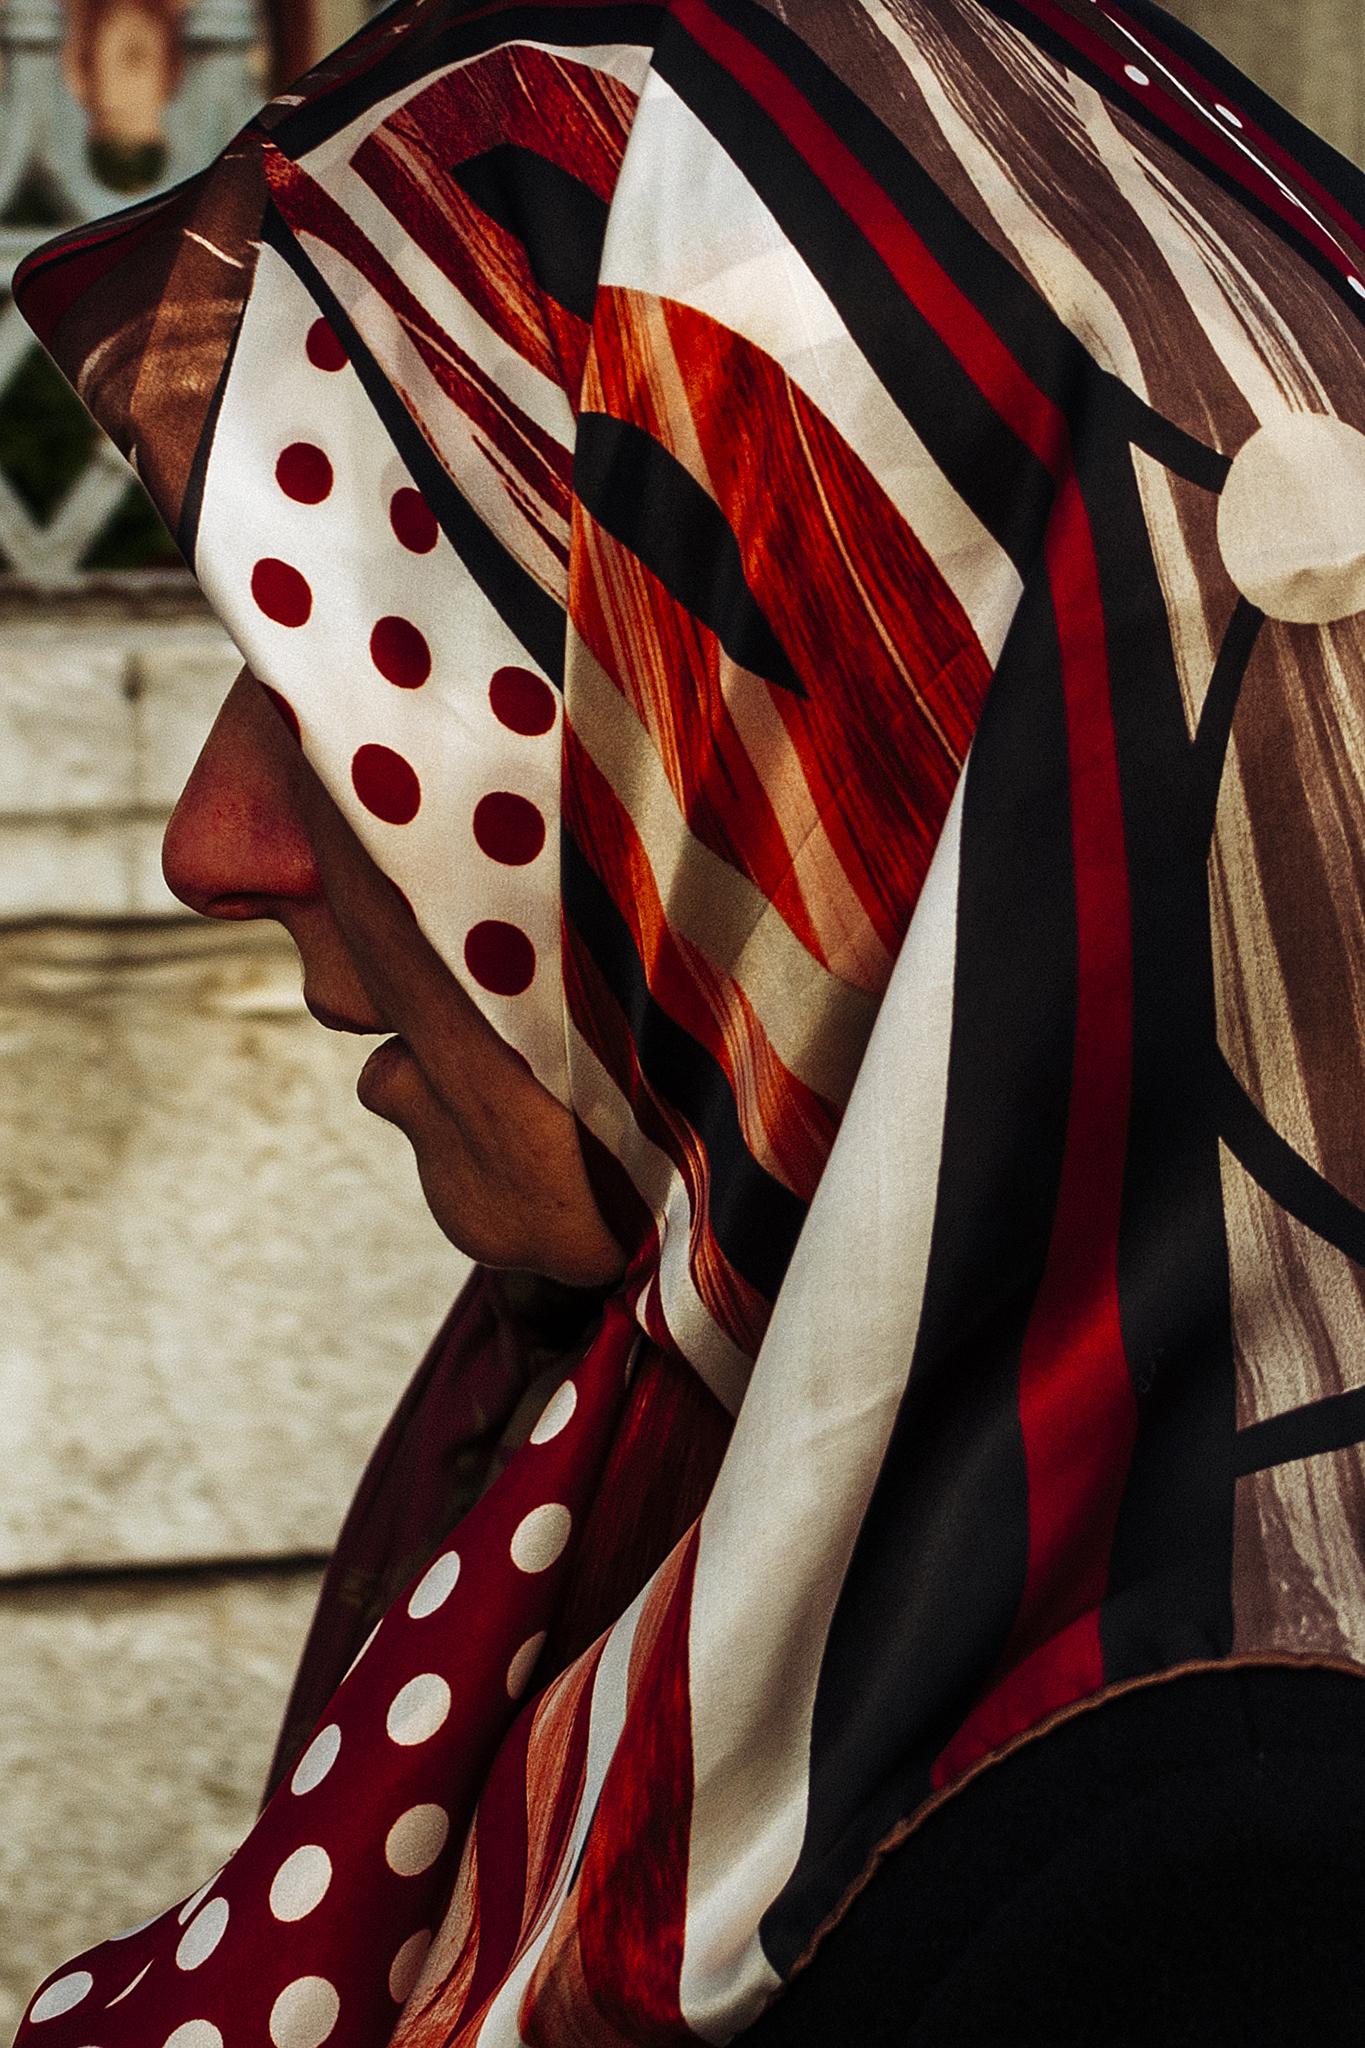 istanbul street photography reportage fotografo venezia mestre